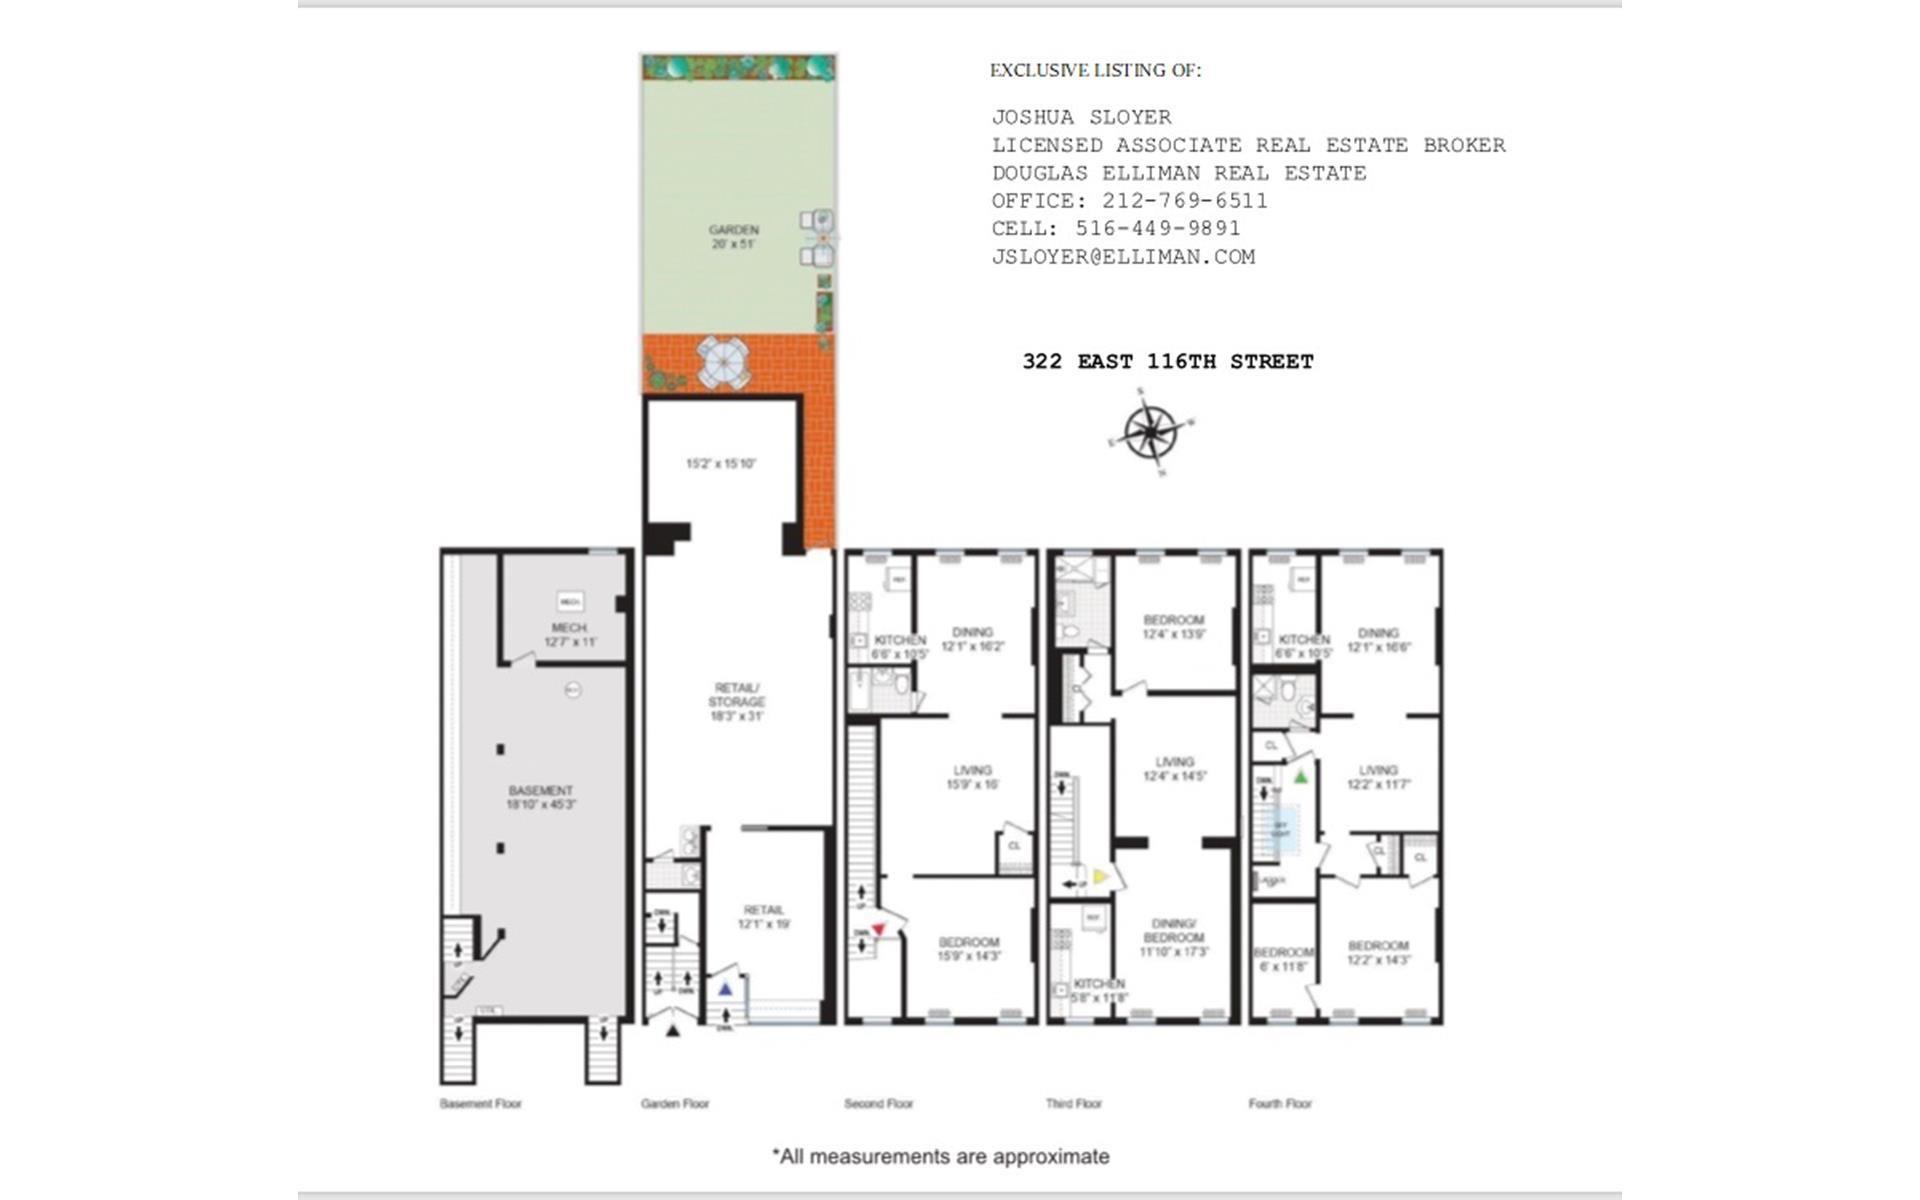 Floor plan of 322-324 East 116th St - East Harlem, New York